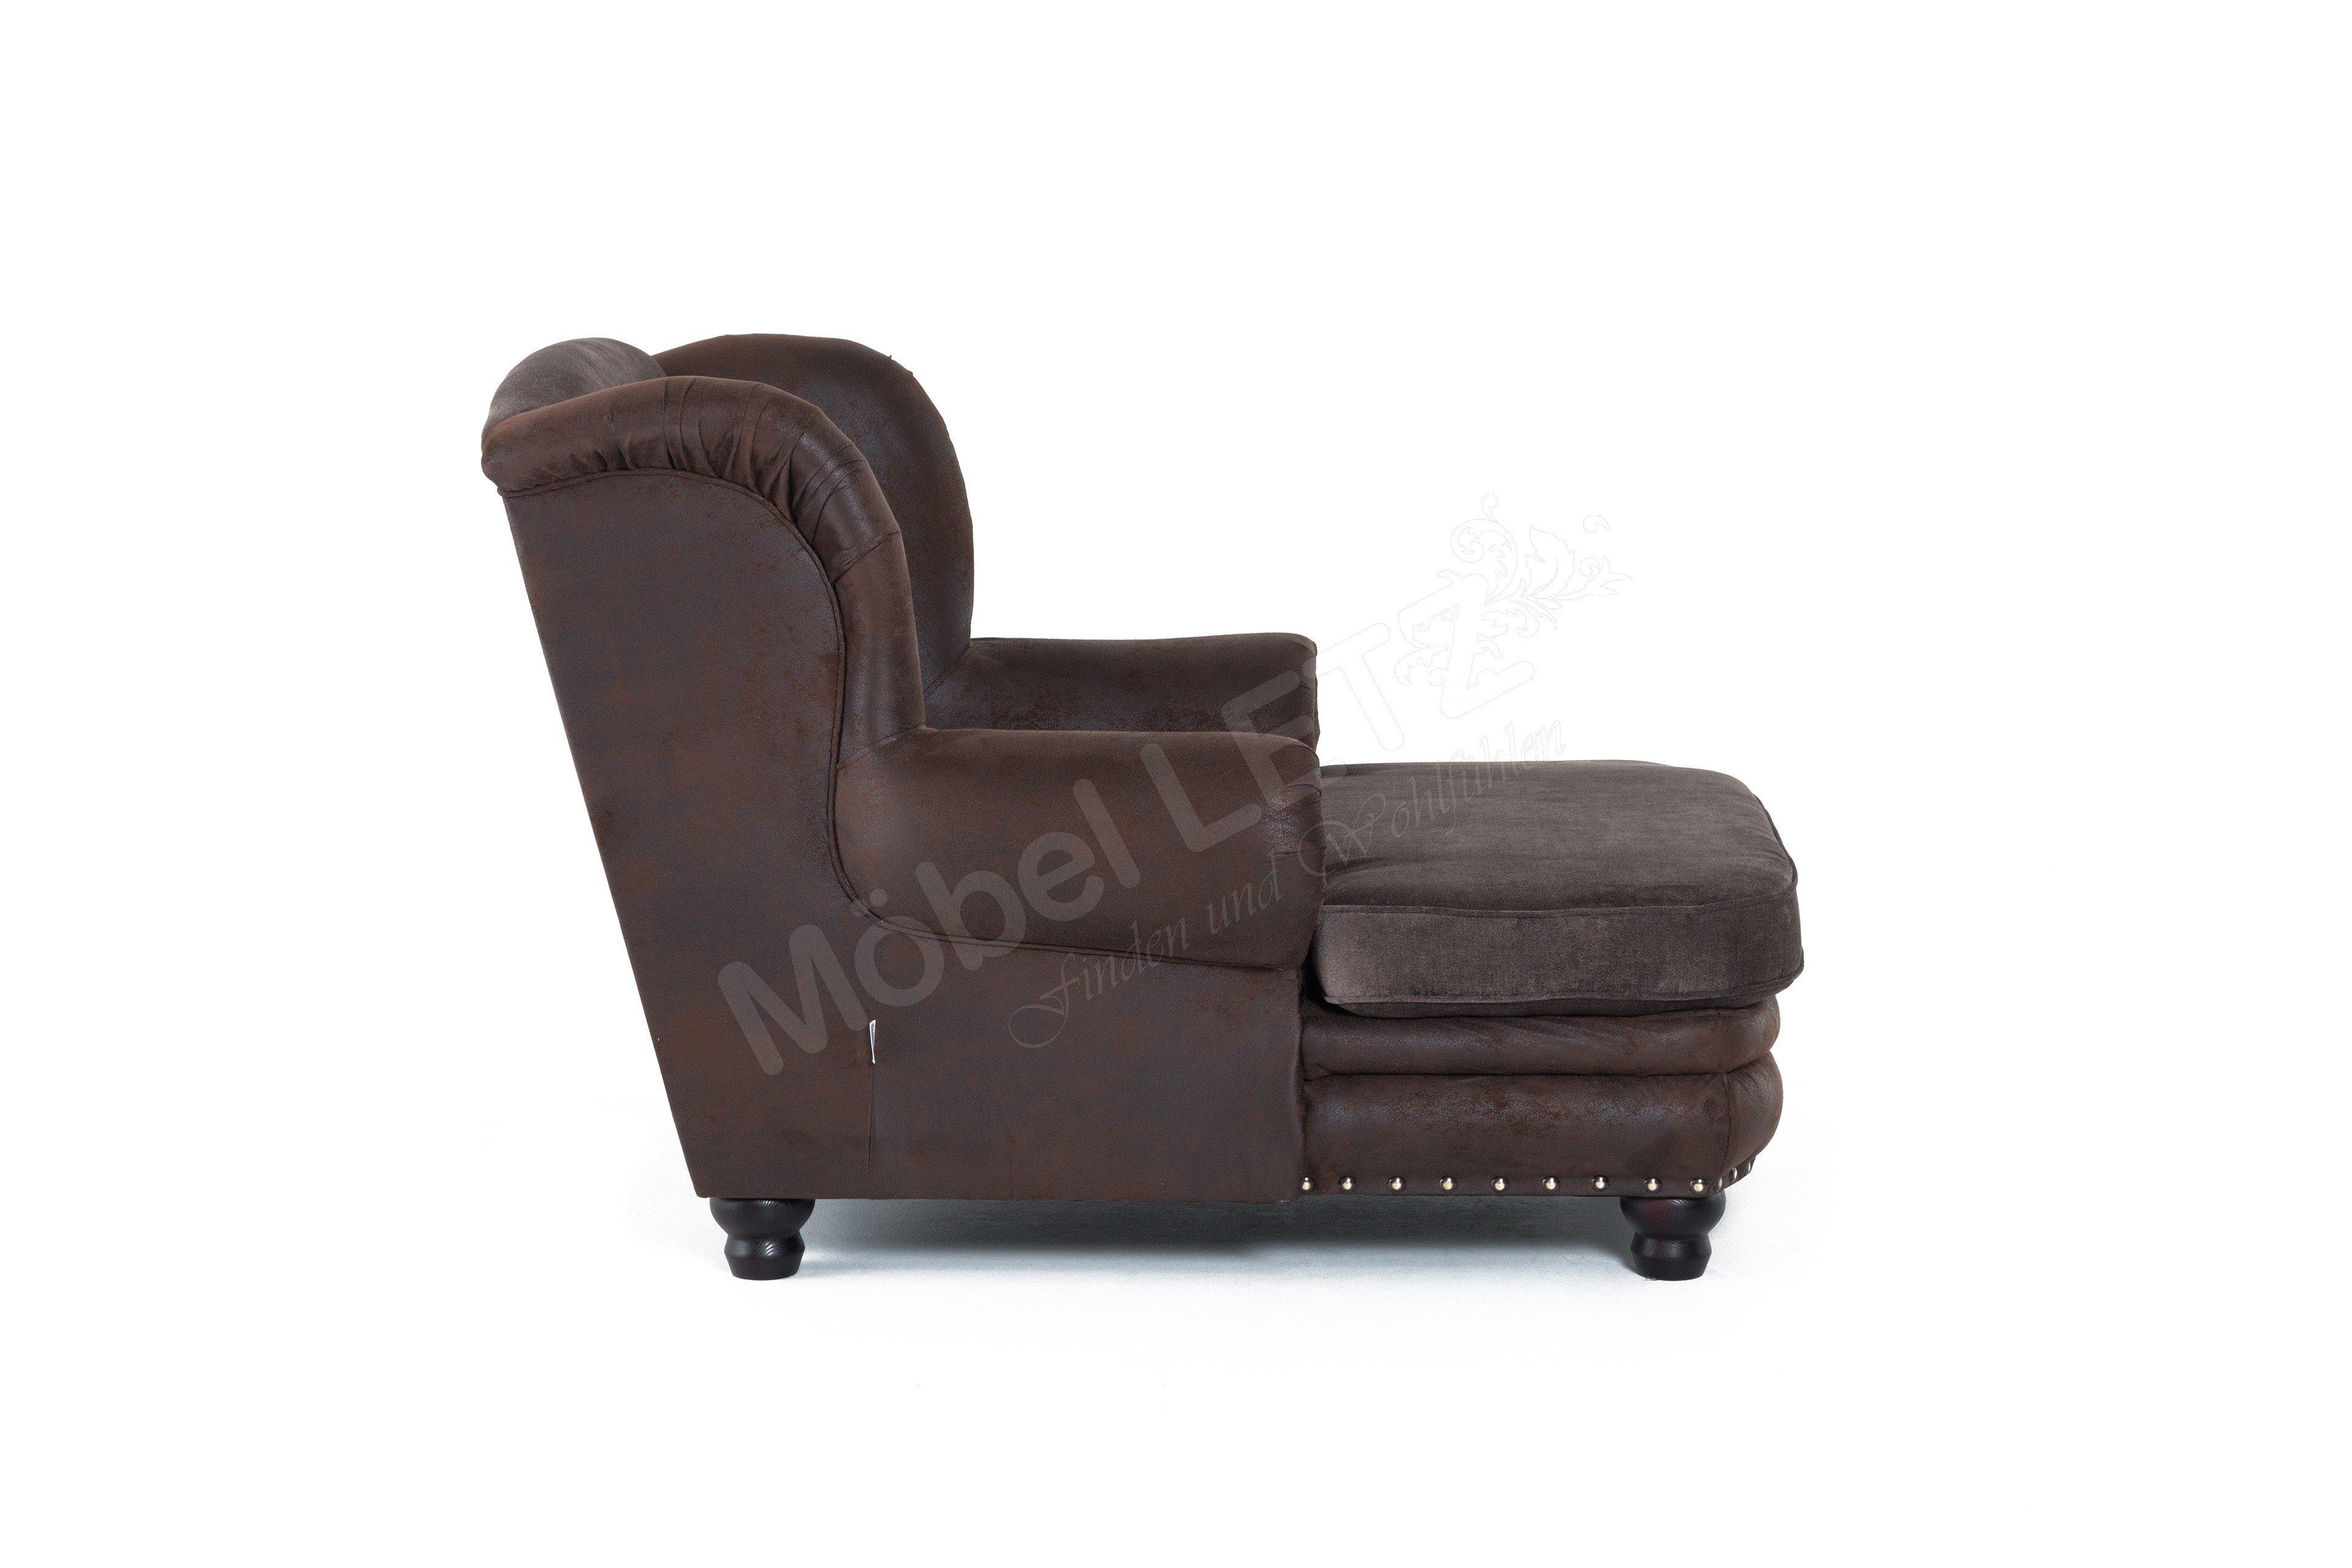 gutmann factory sofa gutmann factory sofa deutsche dekor 2018 online kaufen sofa rozk adana 2. Black Bedroom Furniture Sets. Home Design Ideas